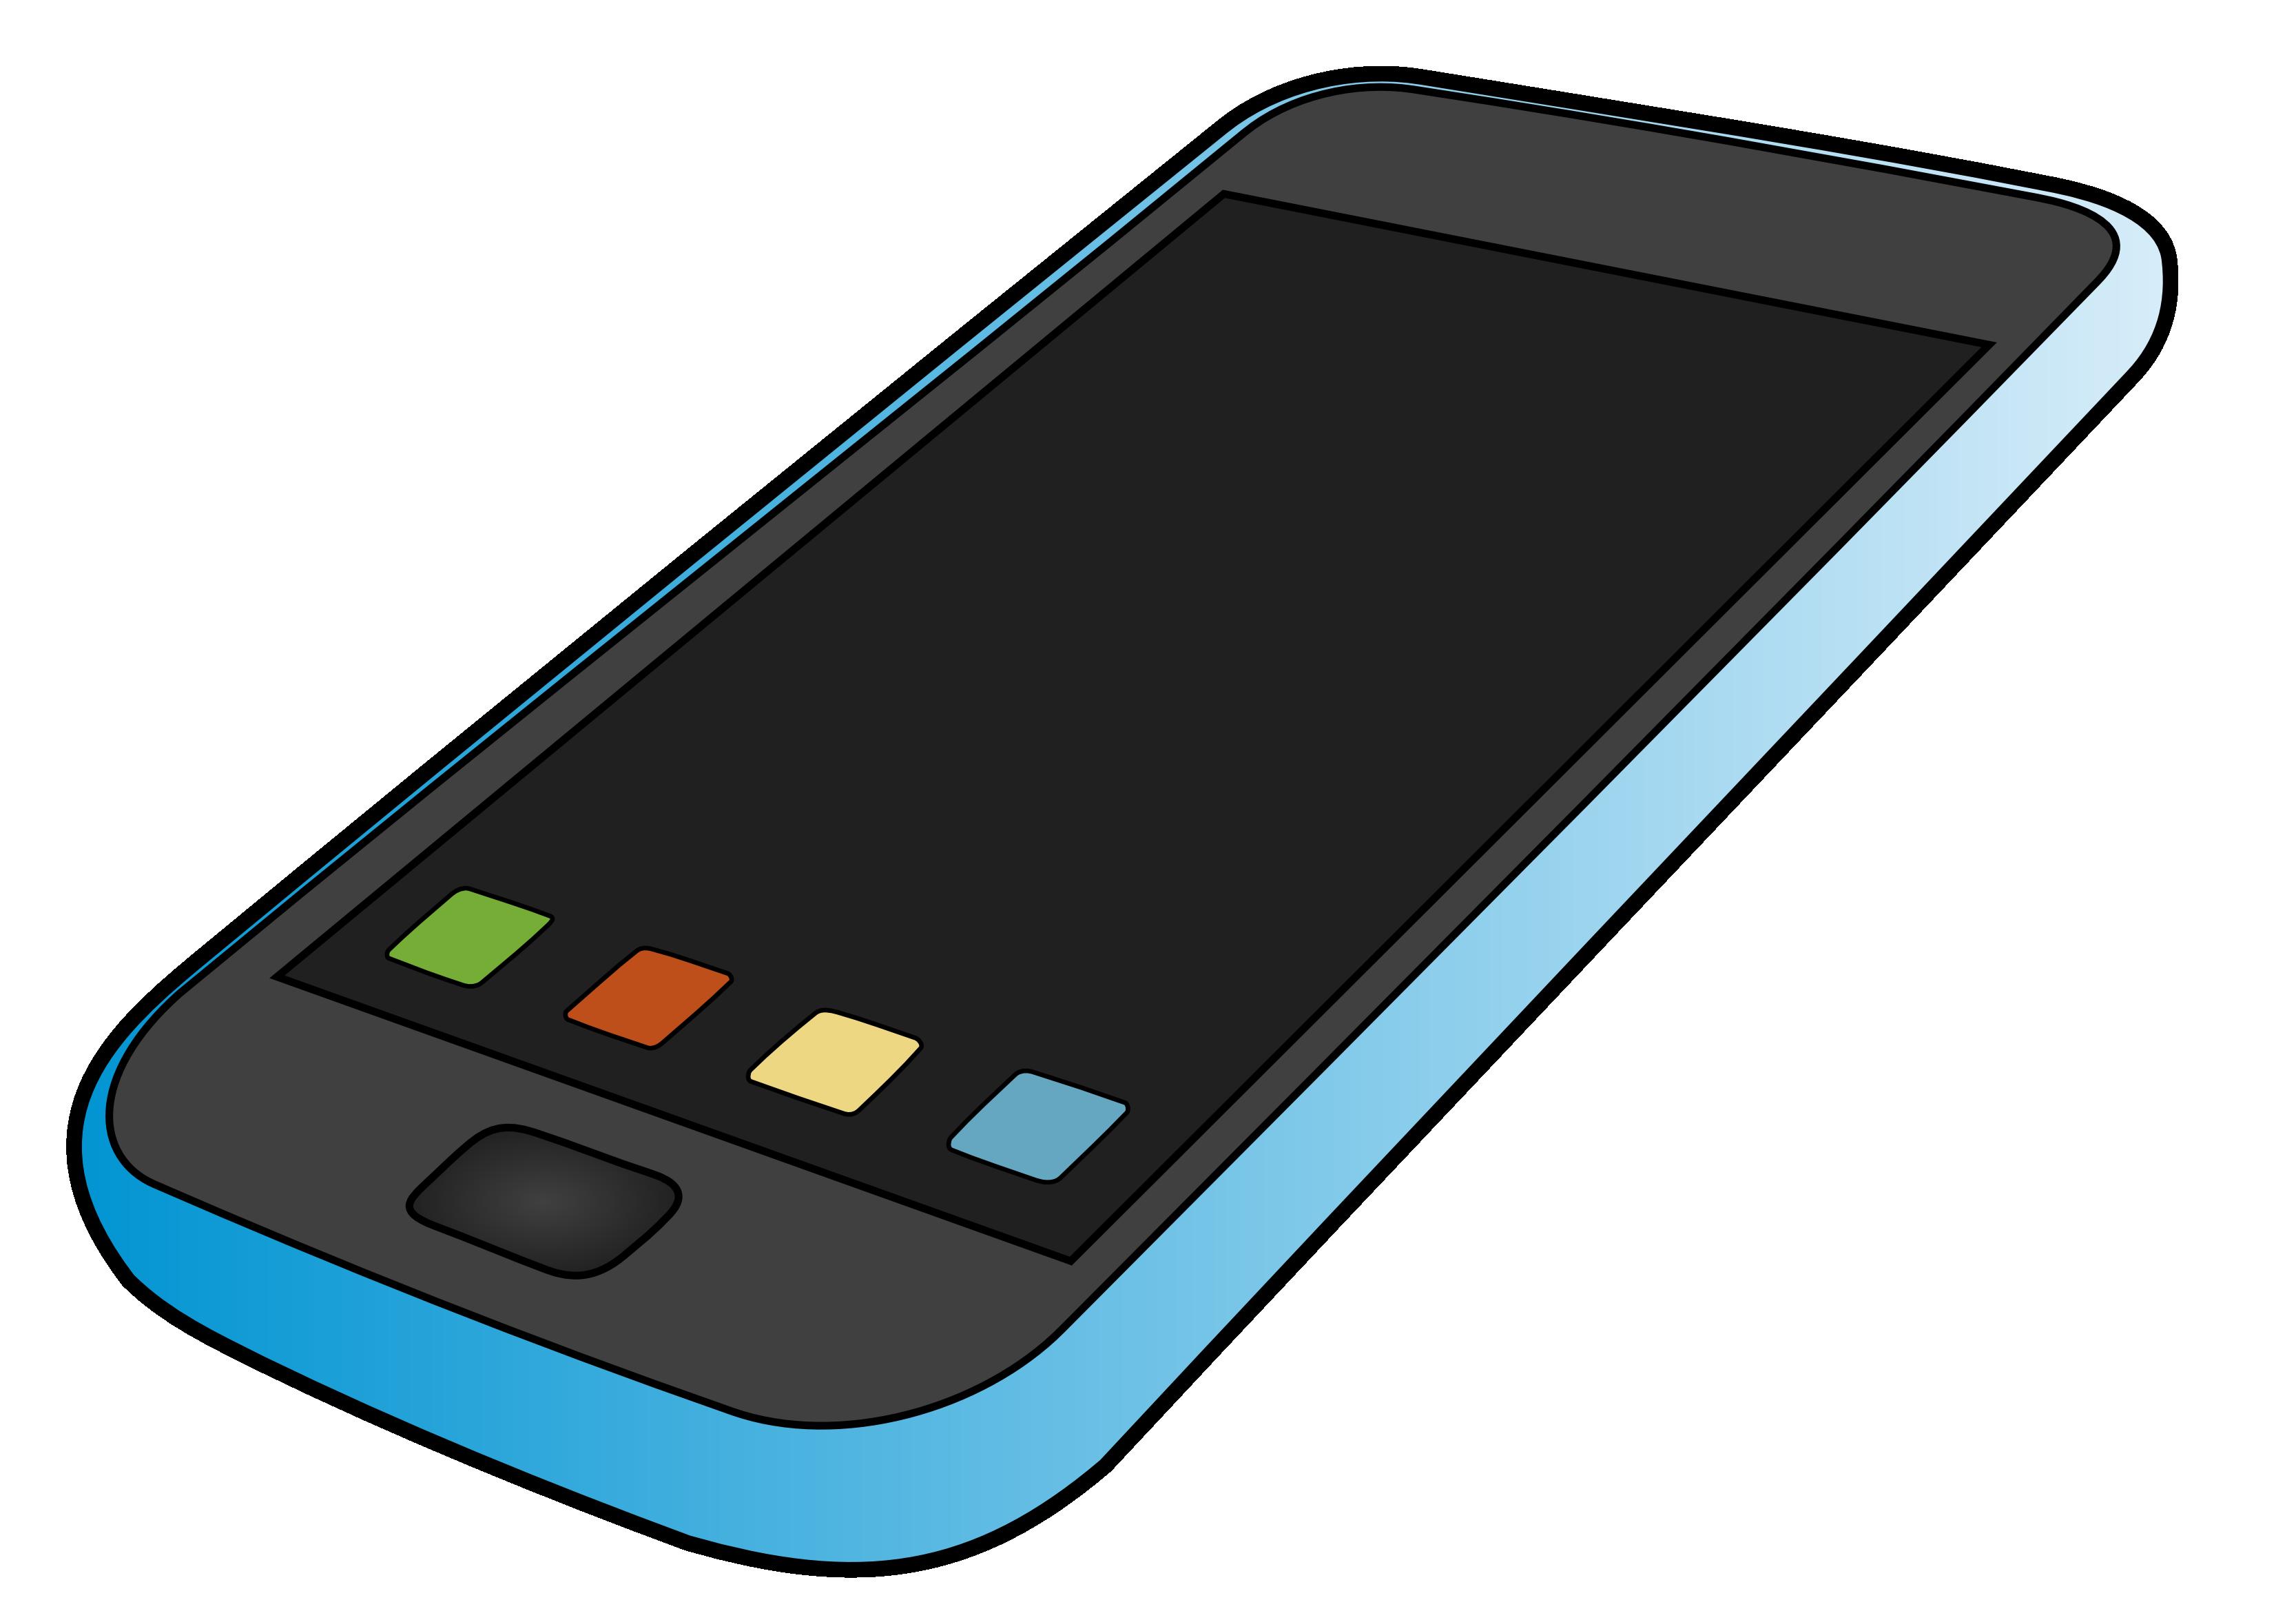 Iphone Clip Art - Cliparts.co